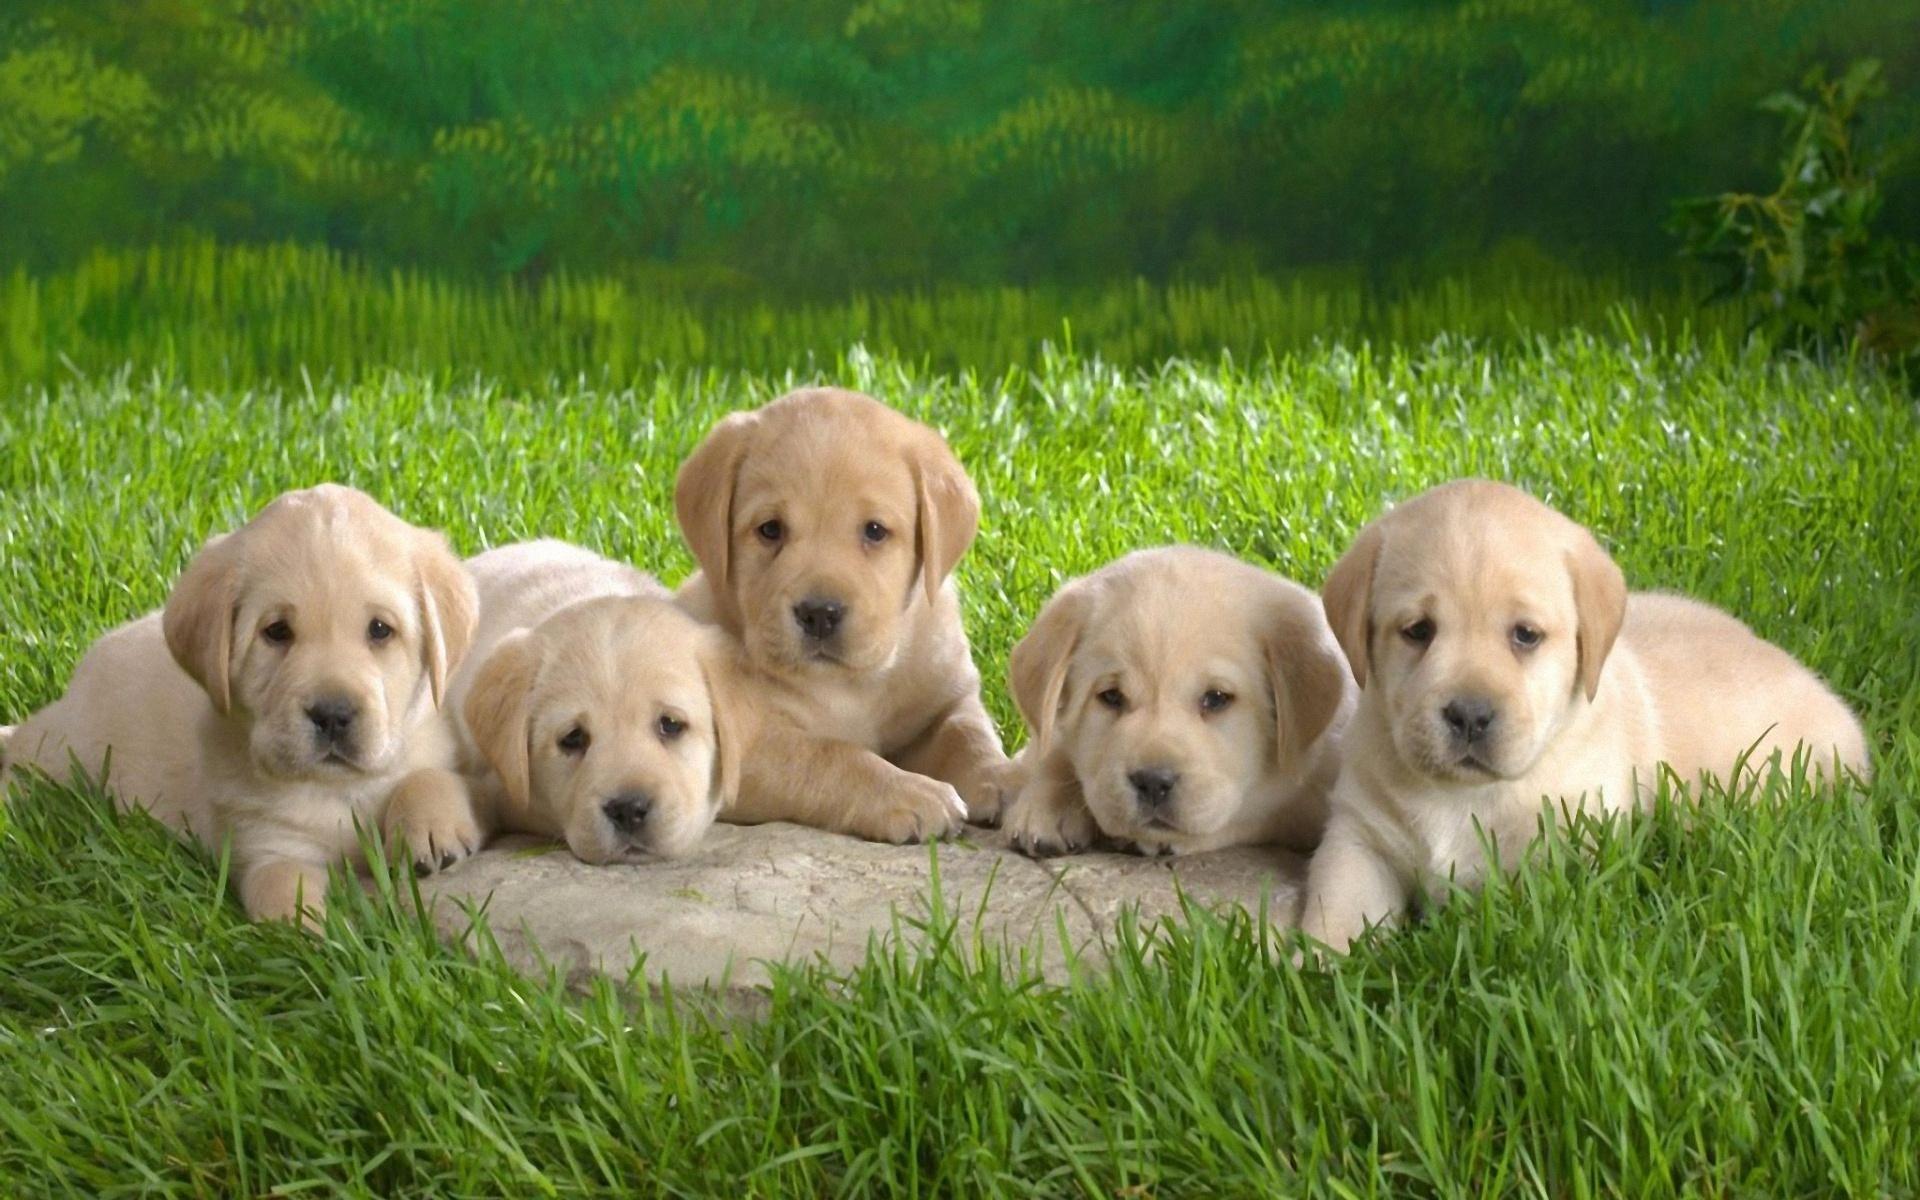 cute puppies hd desktop wallpaper hd desktop wallpaper